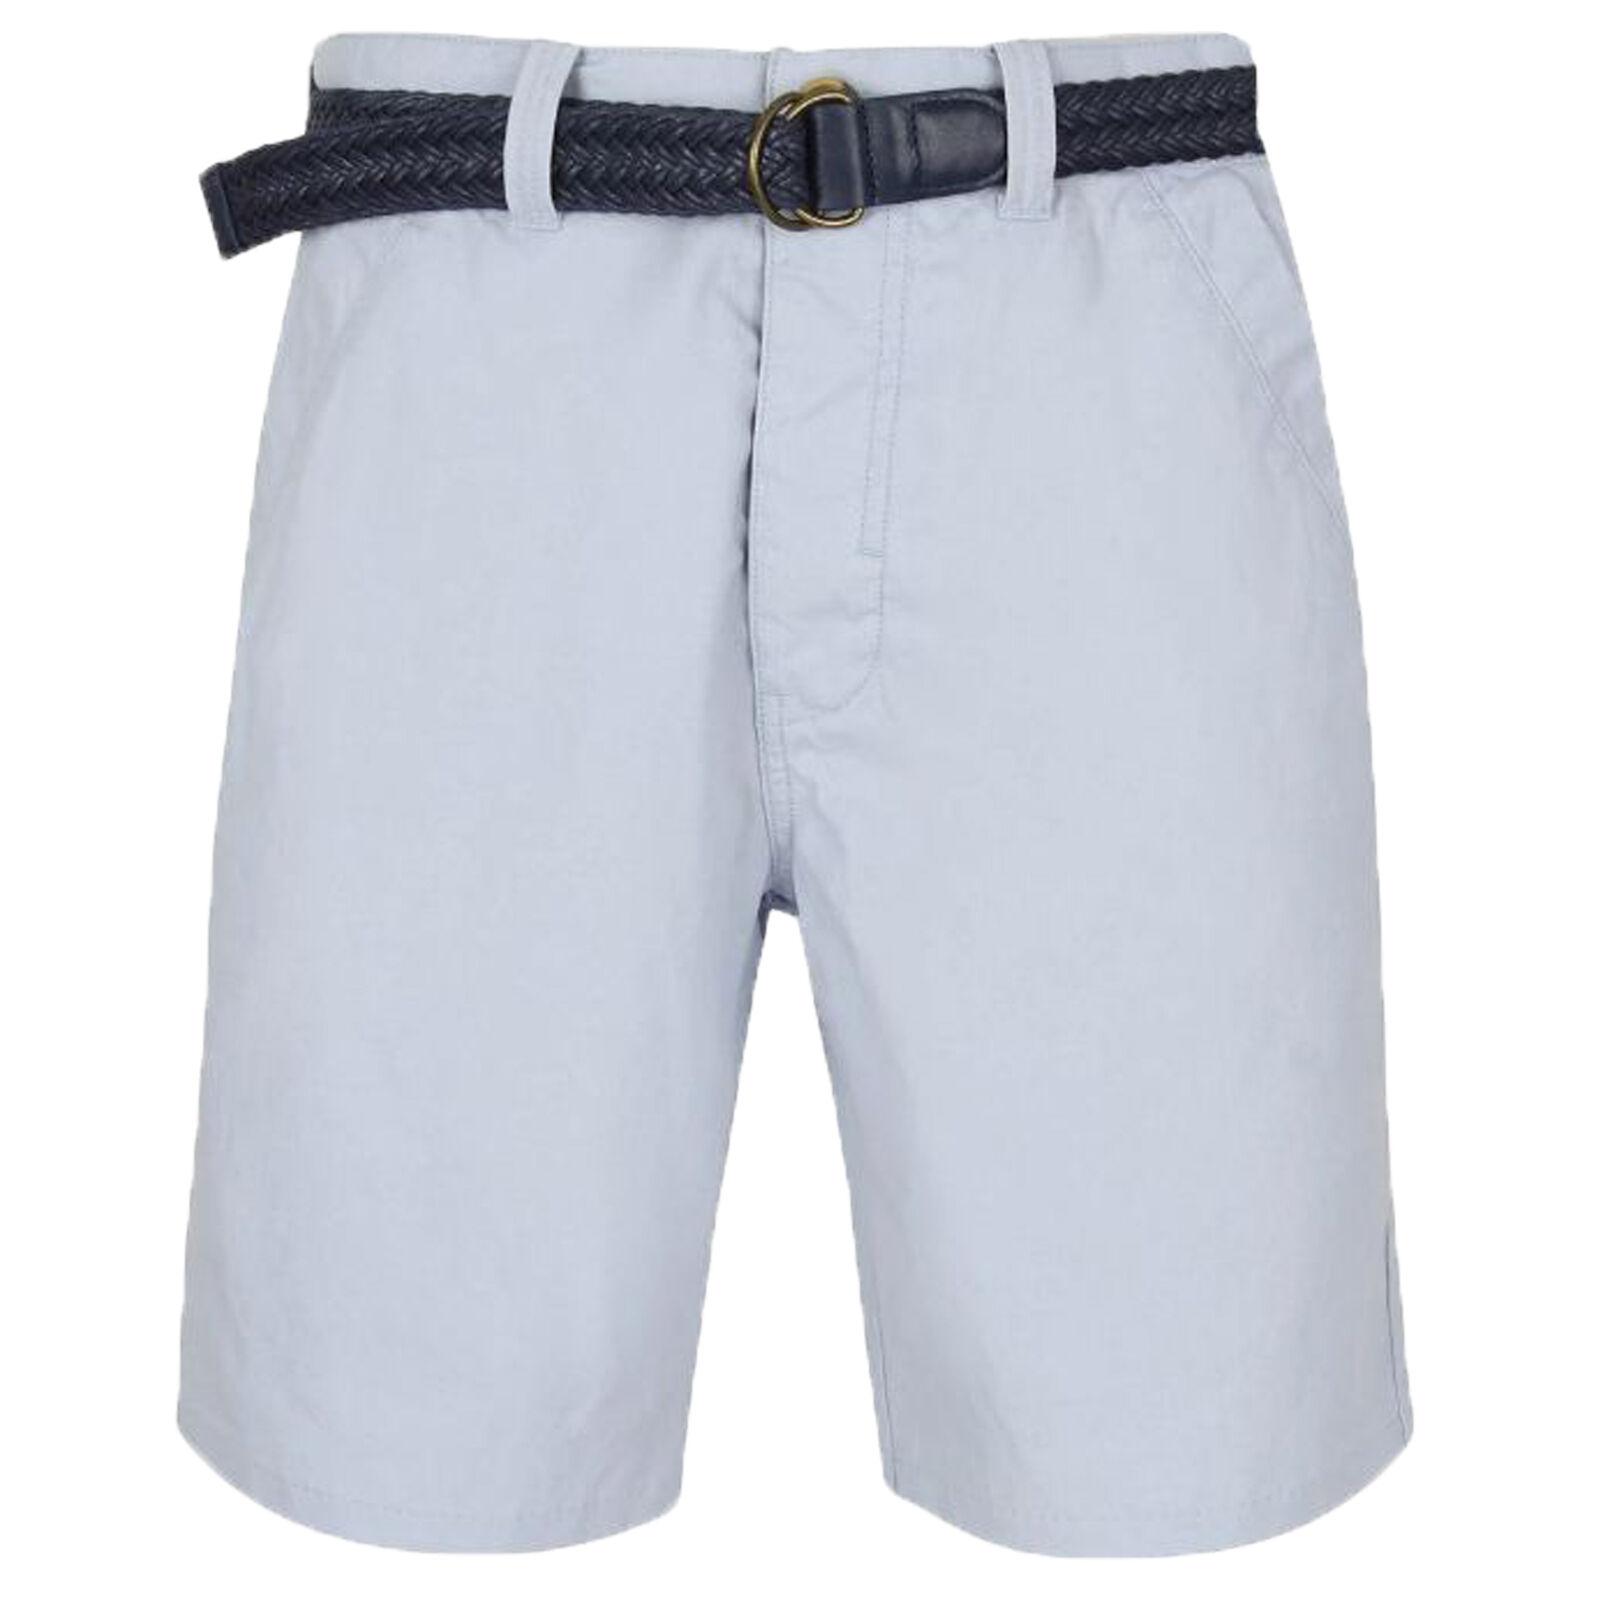 Hombre Tokyo Laundry Shorts Chinos Brad Tejido Belt Peached Acabado Moda Verano